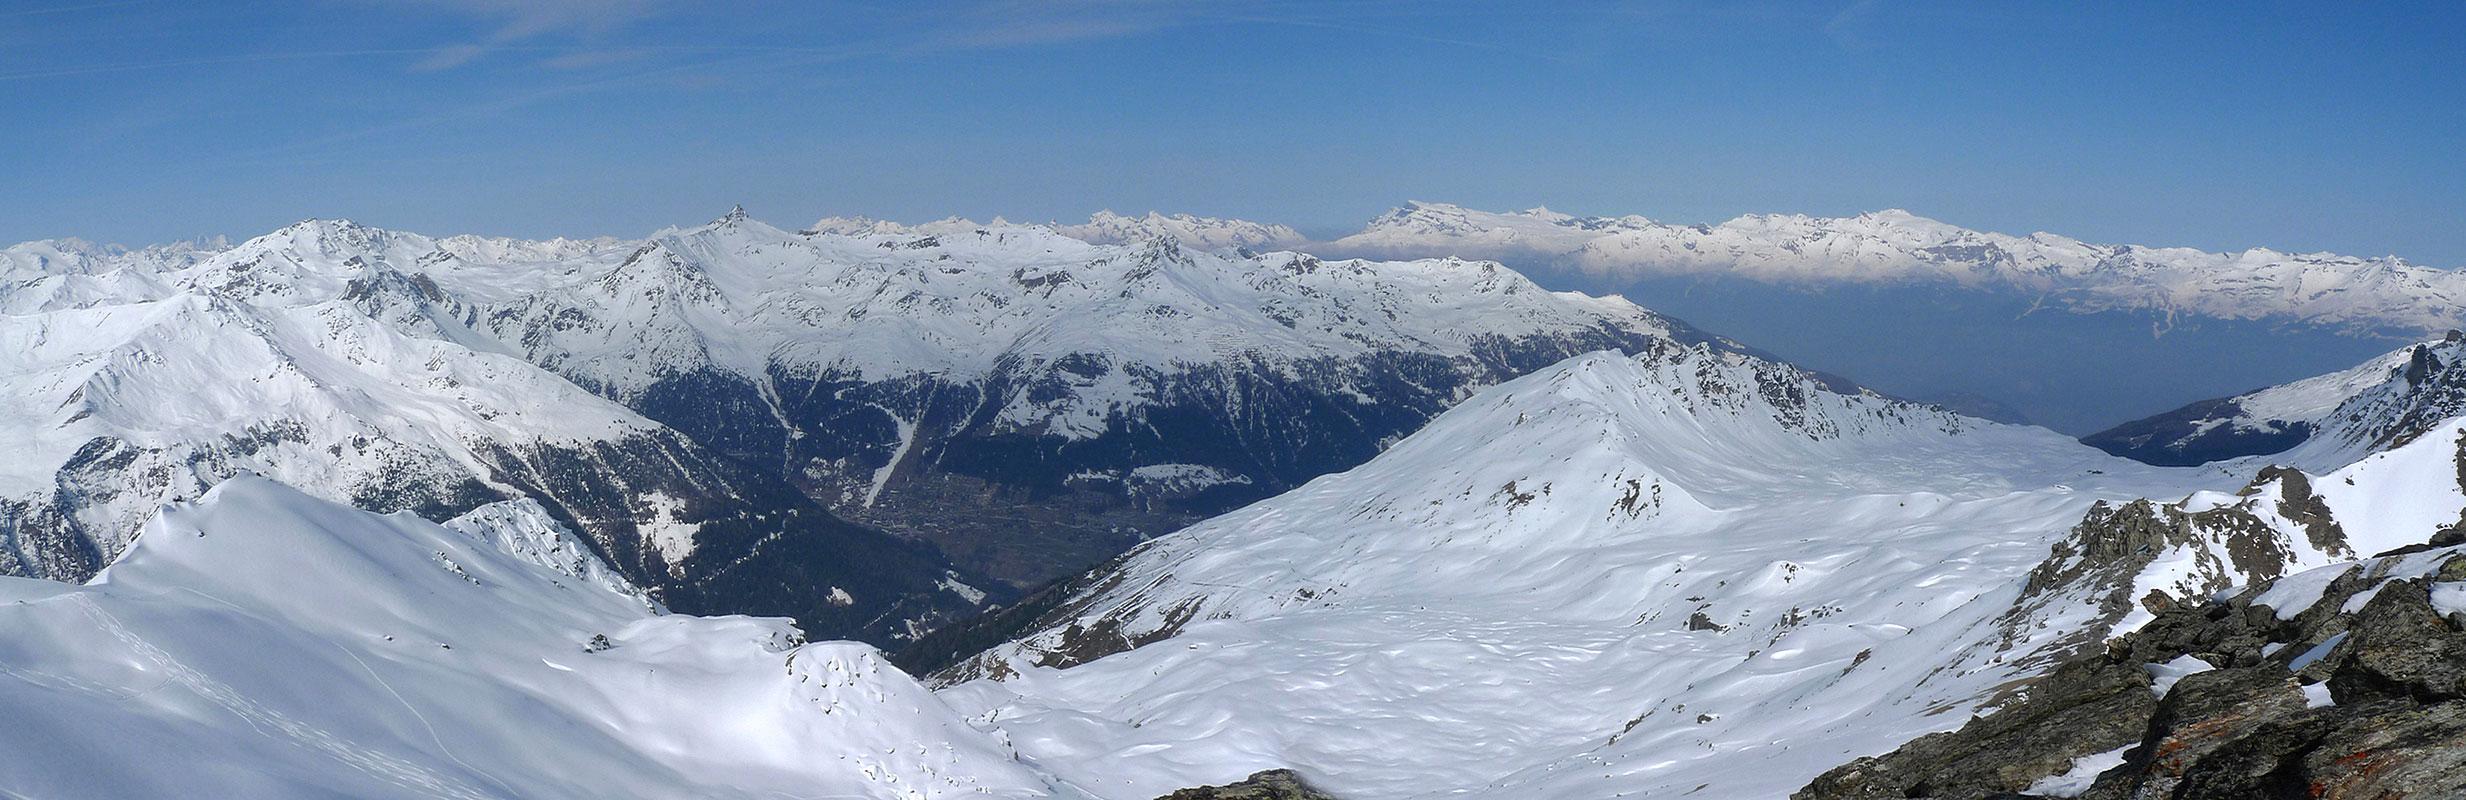 L´Omen Roso Walliser Alpen / Alpes valaisannes Schweiz panorama 32